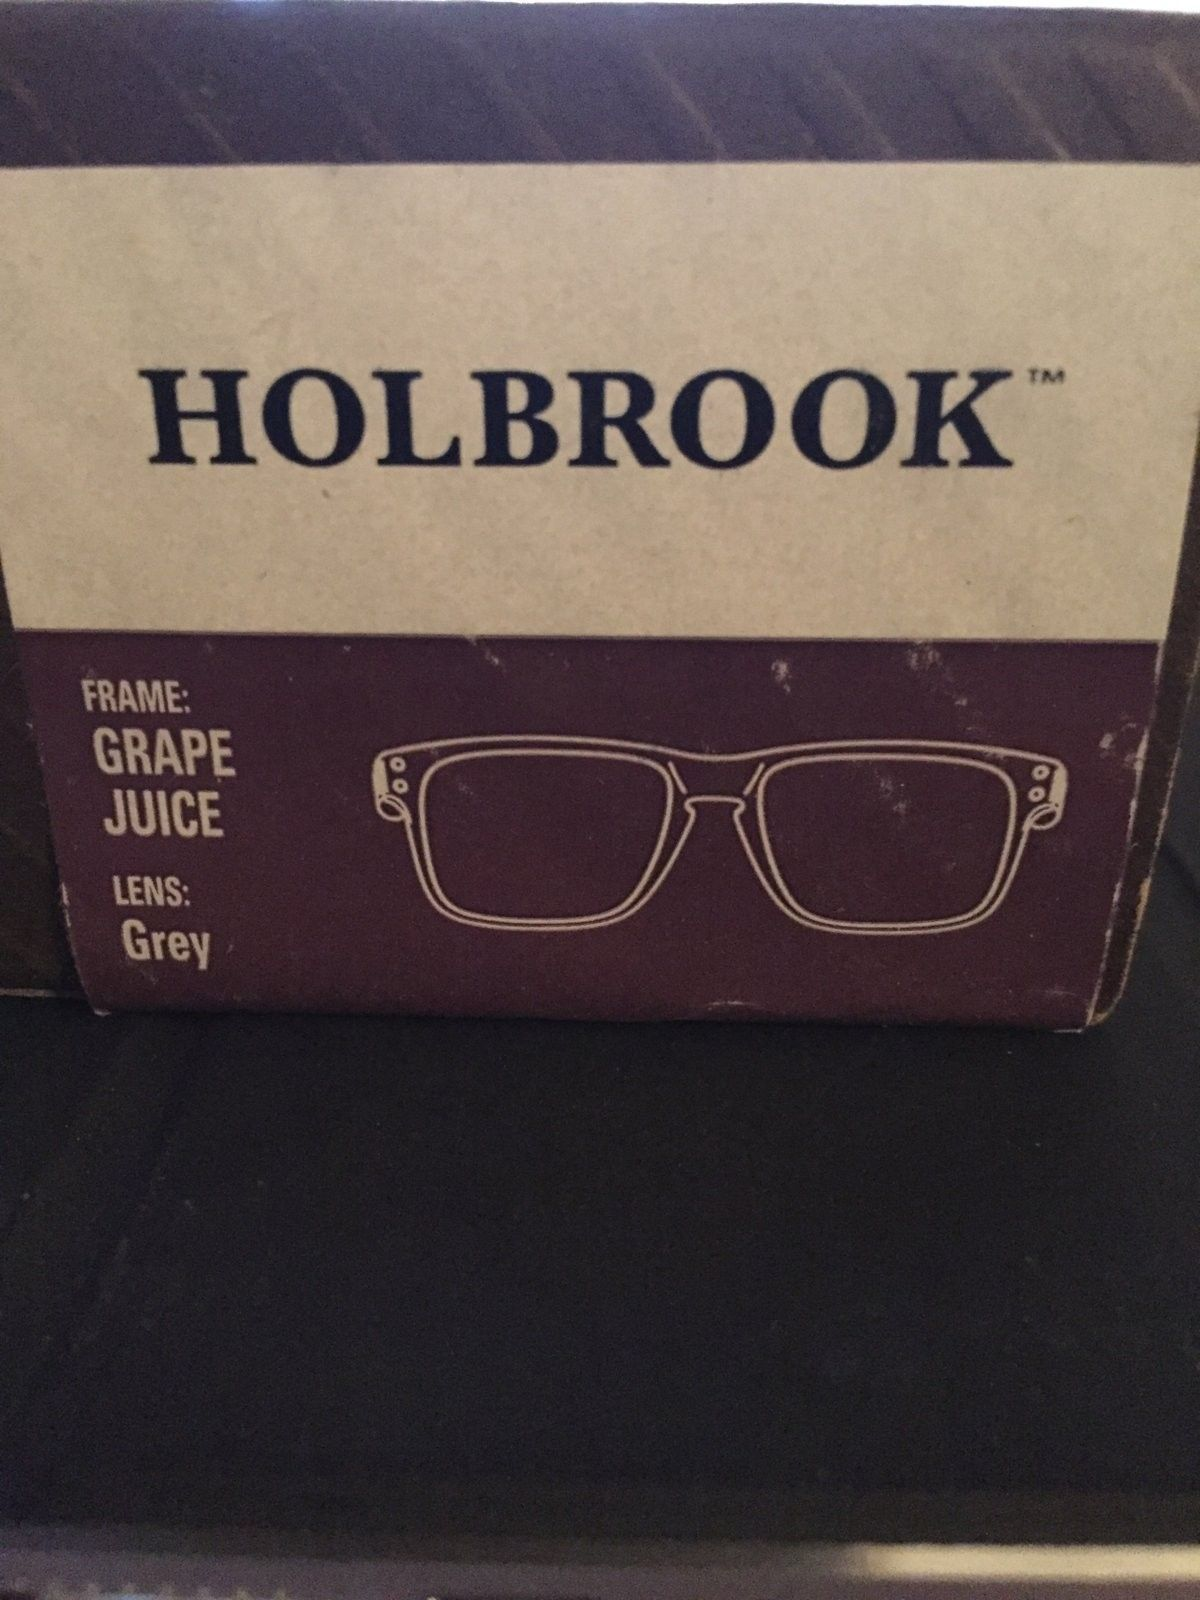 Grape juice Holbrooks - image.jpeg